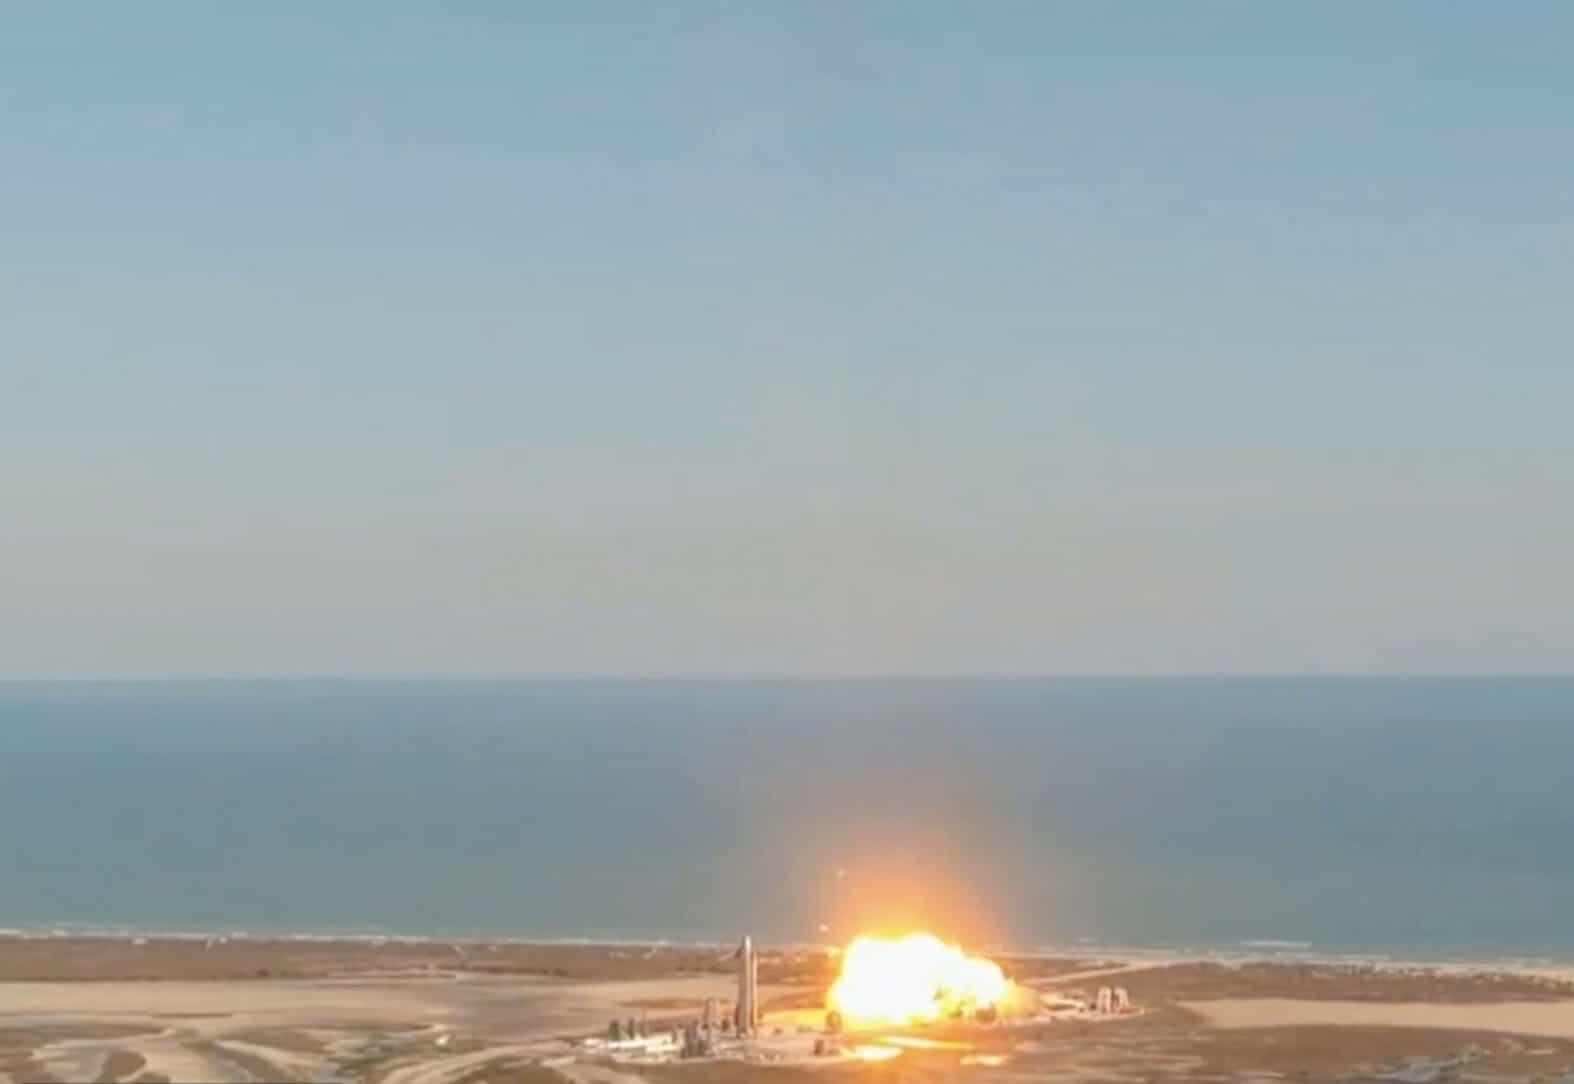 Screenshot starship explosion